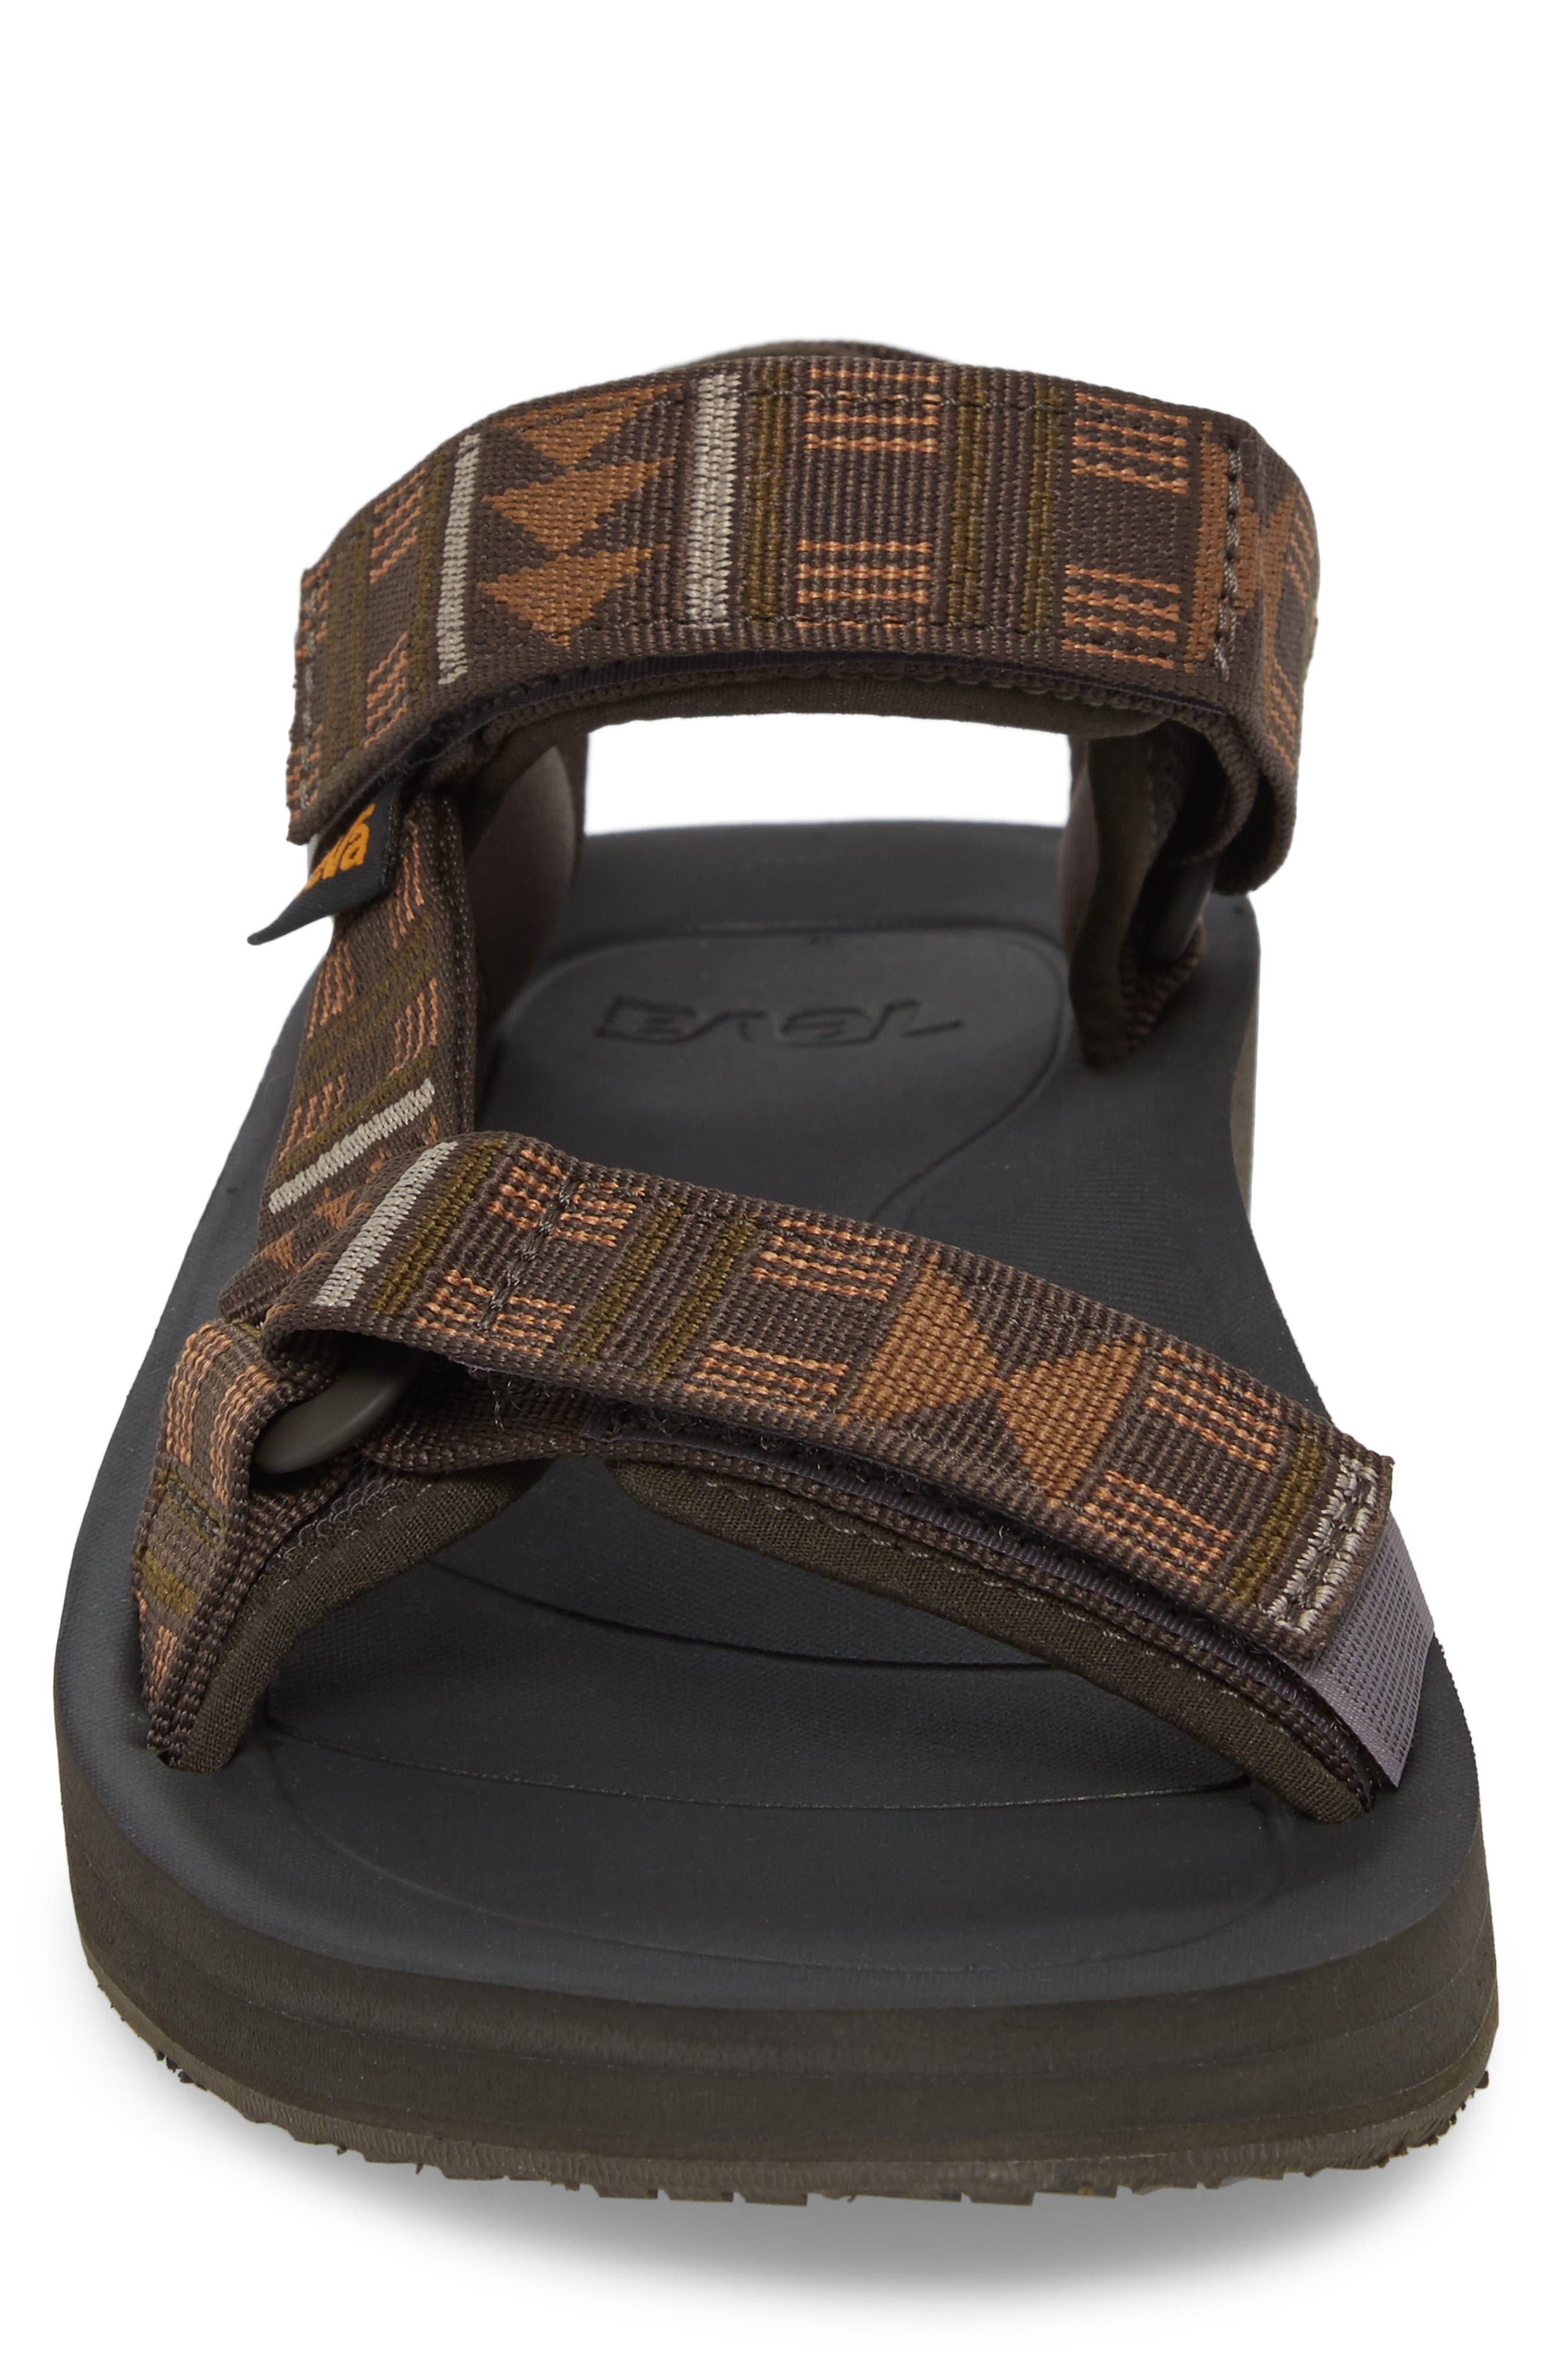 Original Universal Premier Sandal,                             Alternate thumbnail 4, color,                             Brown Nylon